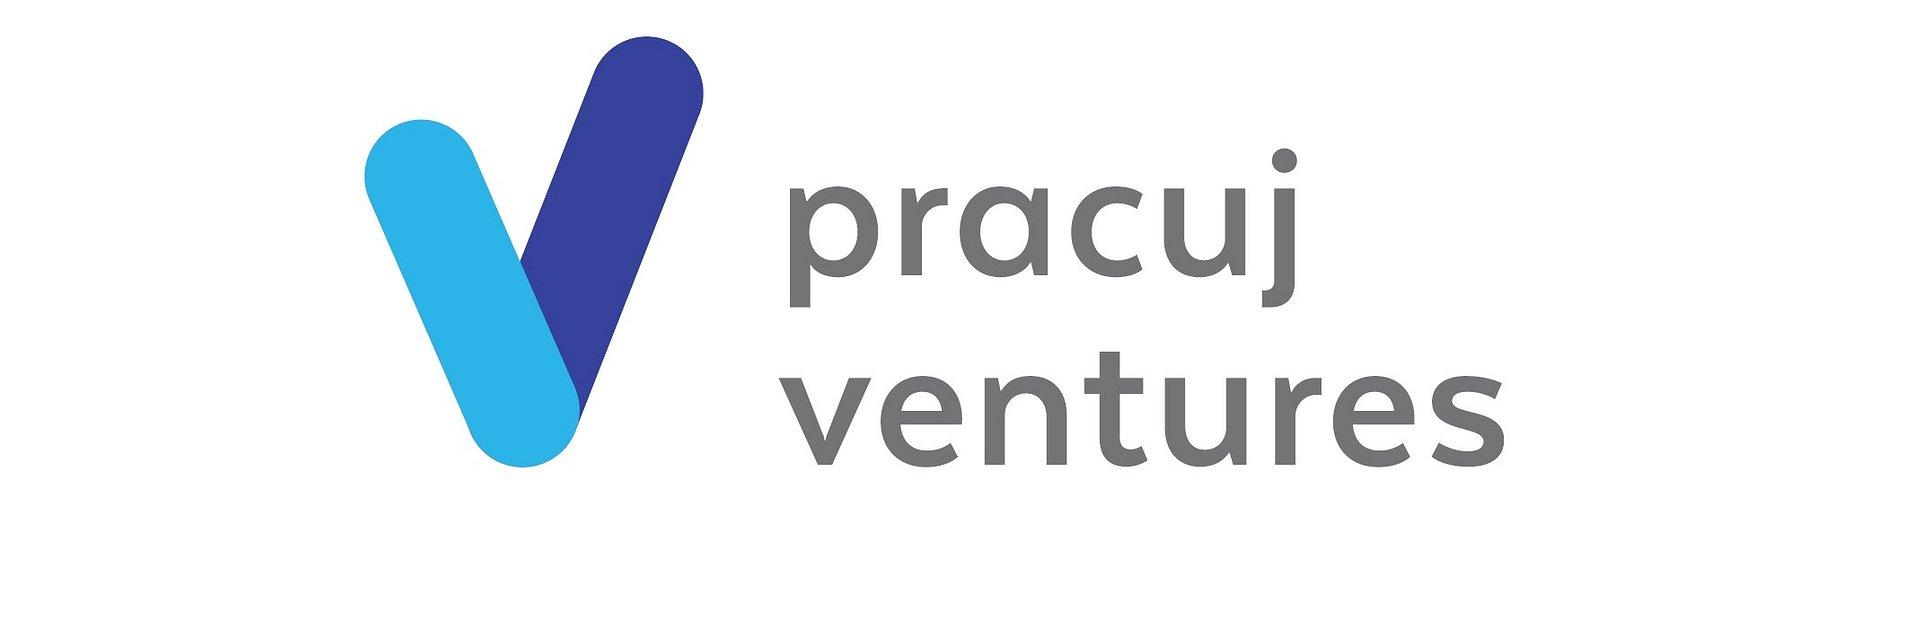 Rusza Pracuj Ventures. Fundusz wesprze startupy HRTech i EduTech